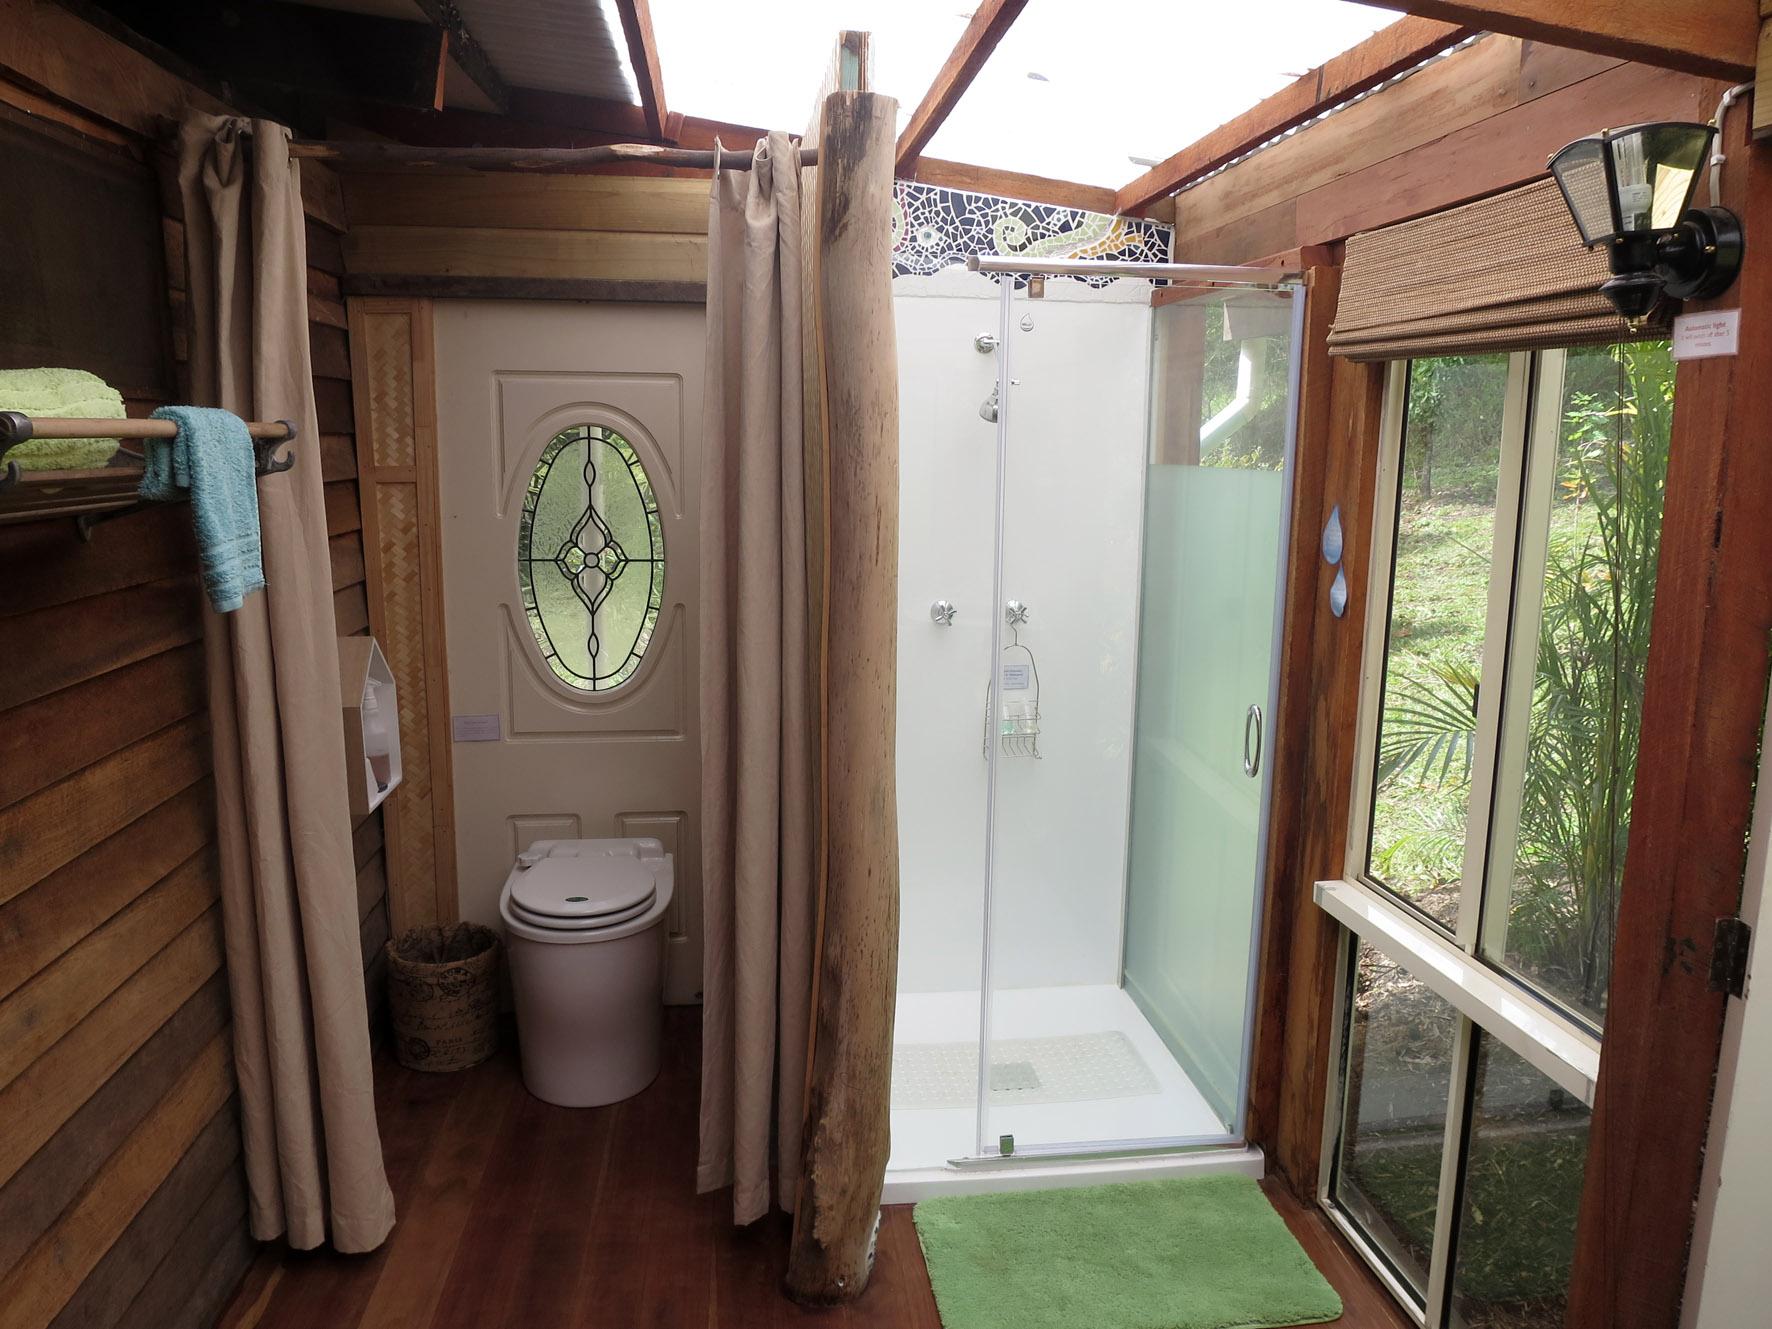 Composting toilets & shower